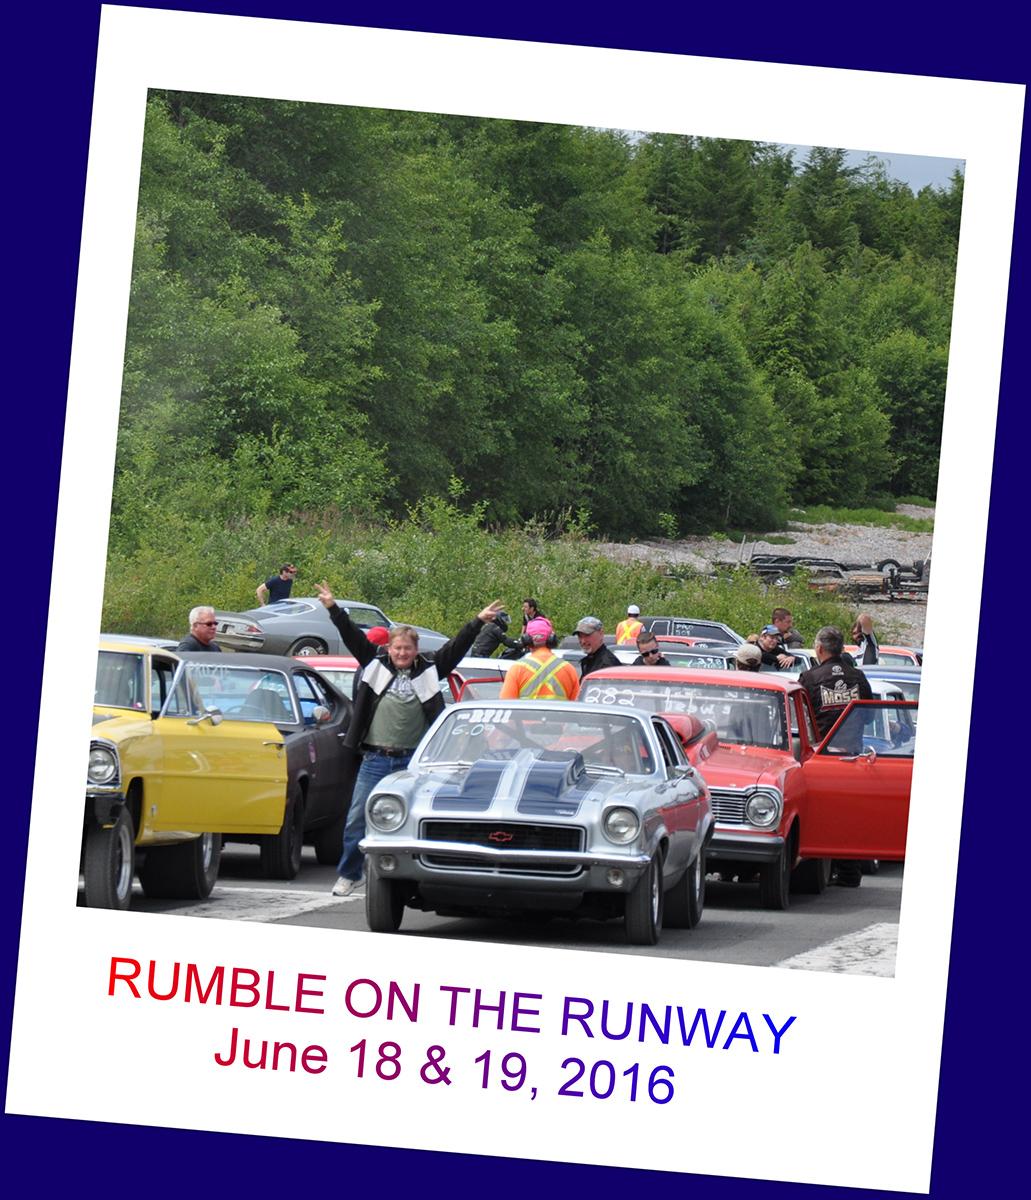 Rumble on the Runway June 18 & 19, 2016 592